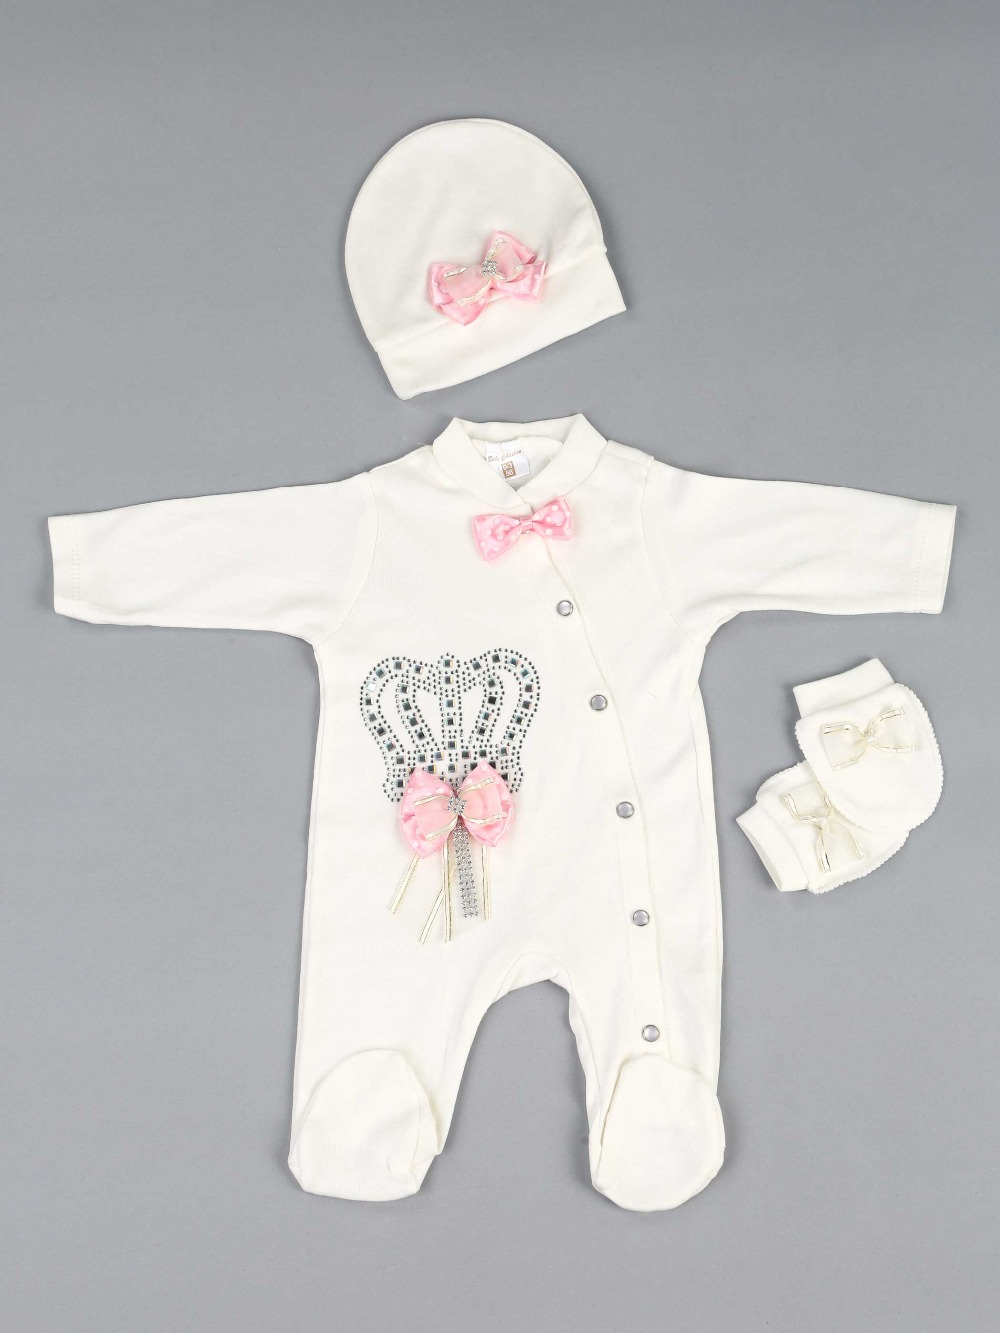 083-5181-021 Pembe Prenses Kız Bebek 3 lü Tulum Seti (1)